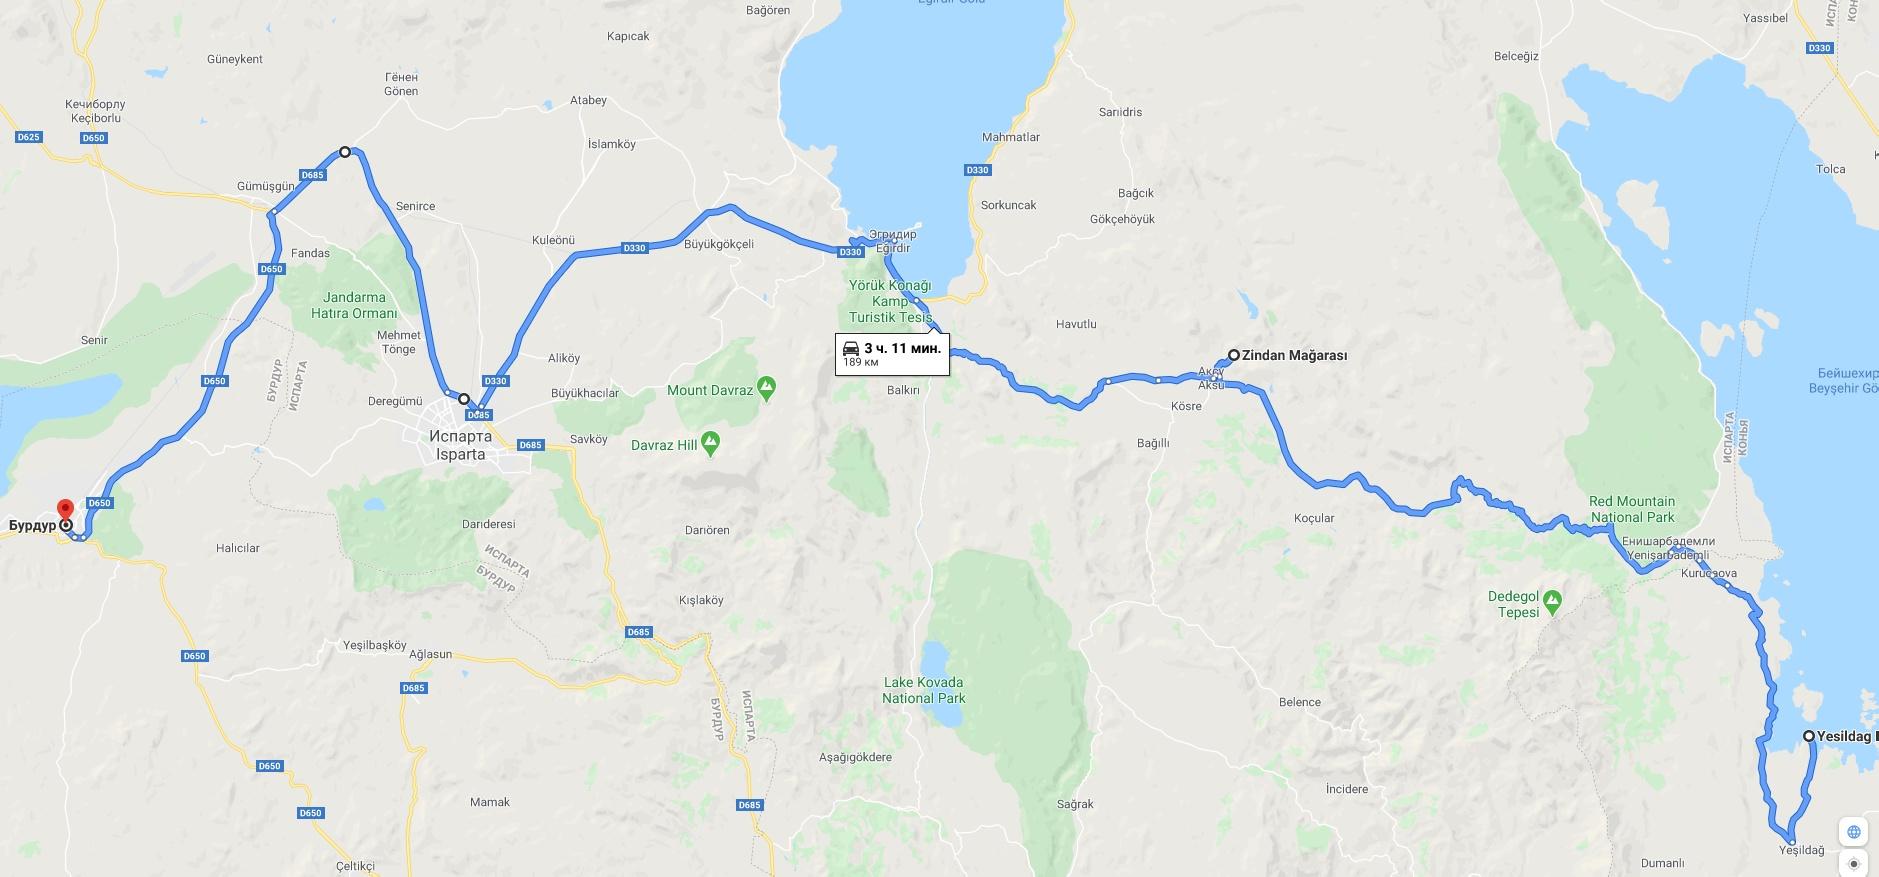 Часть 5. Бурдур, Кибира, Датча, Галлиполи